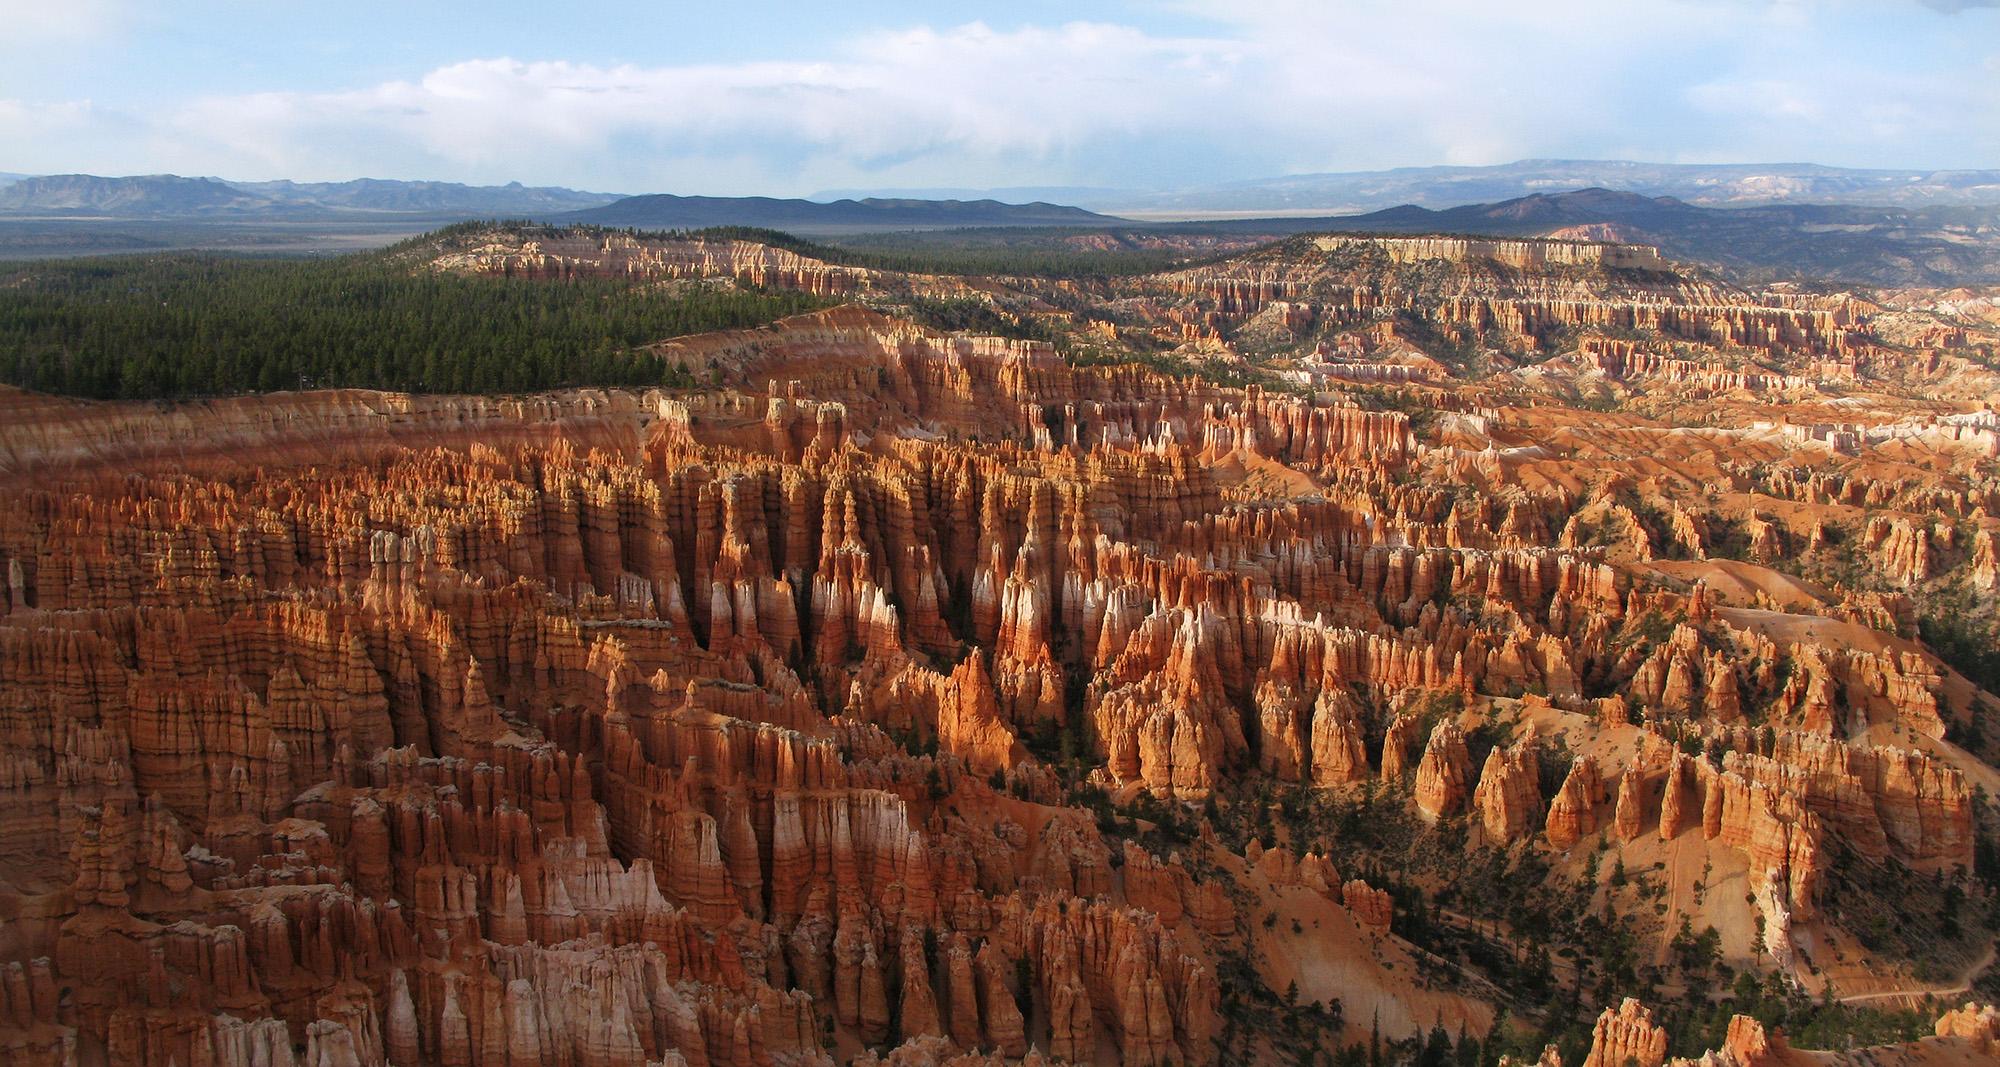 http://beautifulplacestovisit.com/large/canyons/Bryce_Canyon_Utah3.jpg